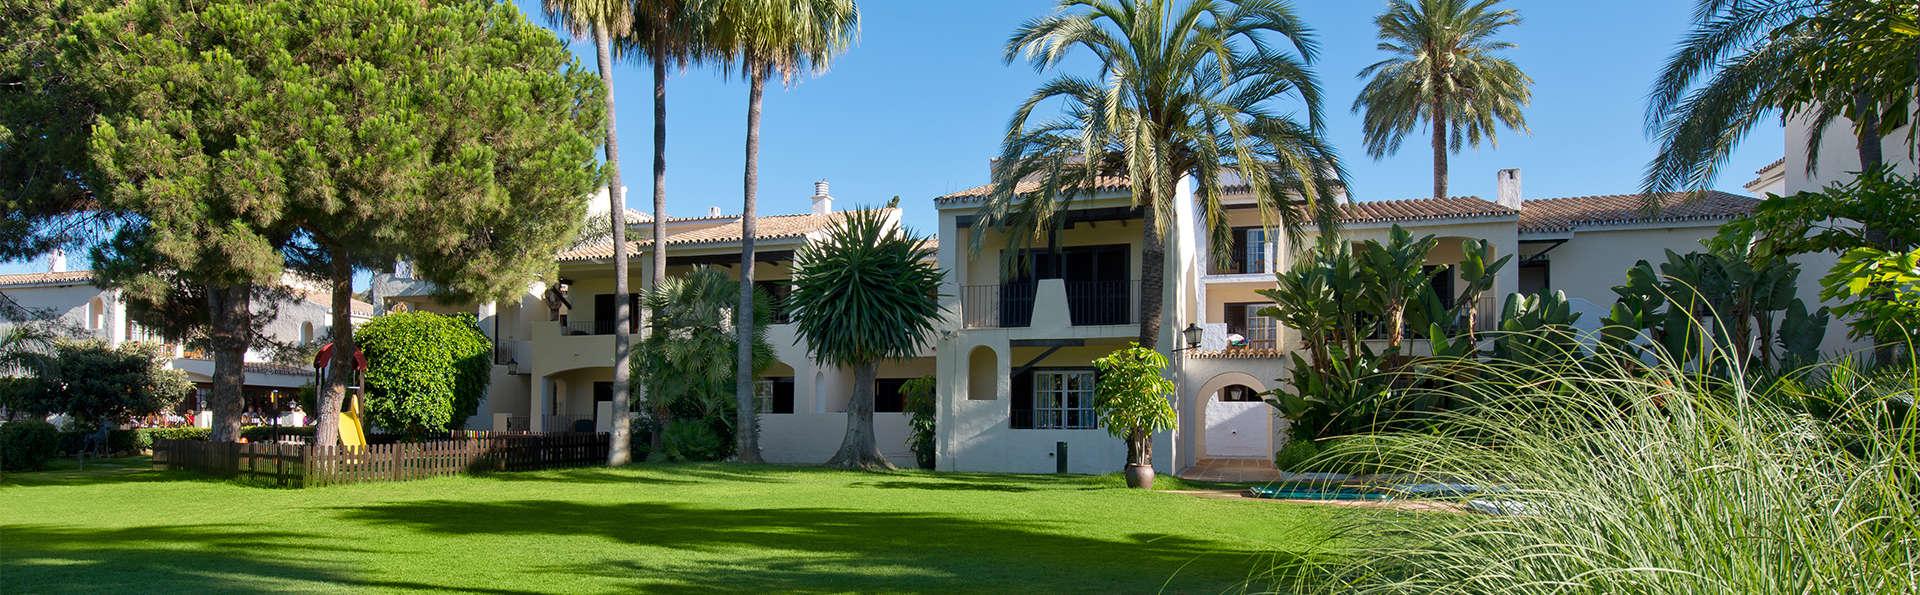 Hotel Bluebay Banus - EDIT_gardens6.jpg